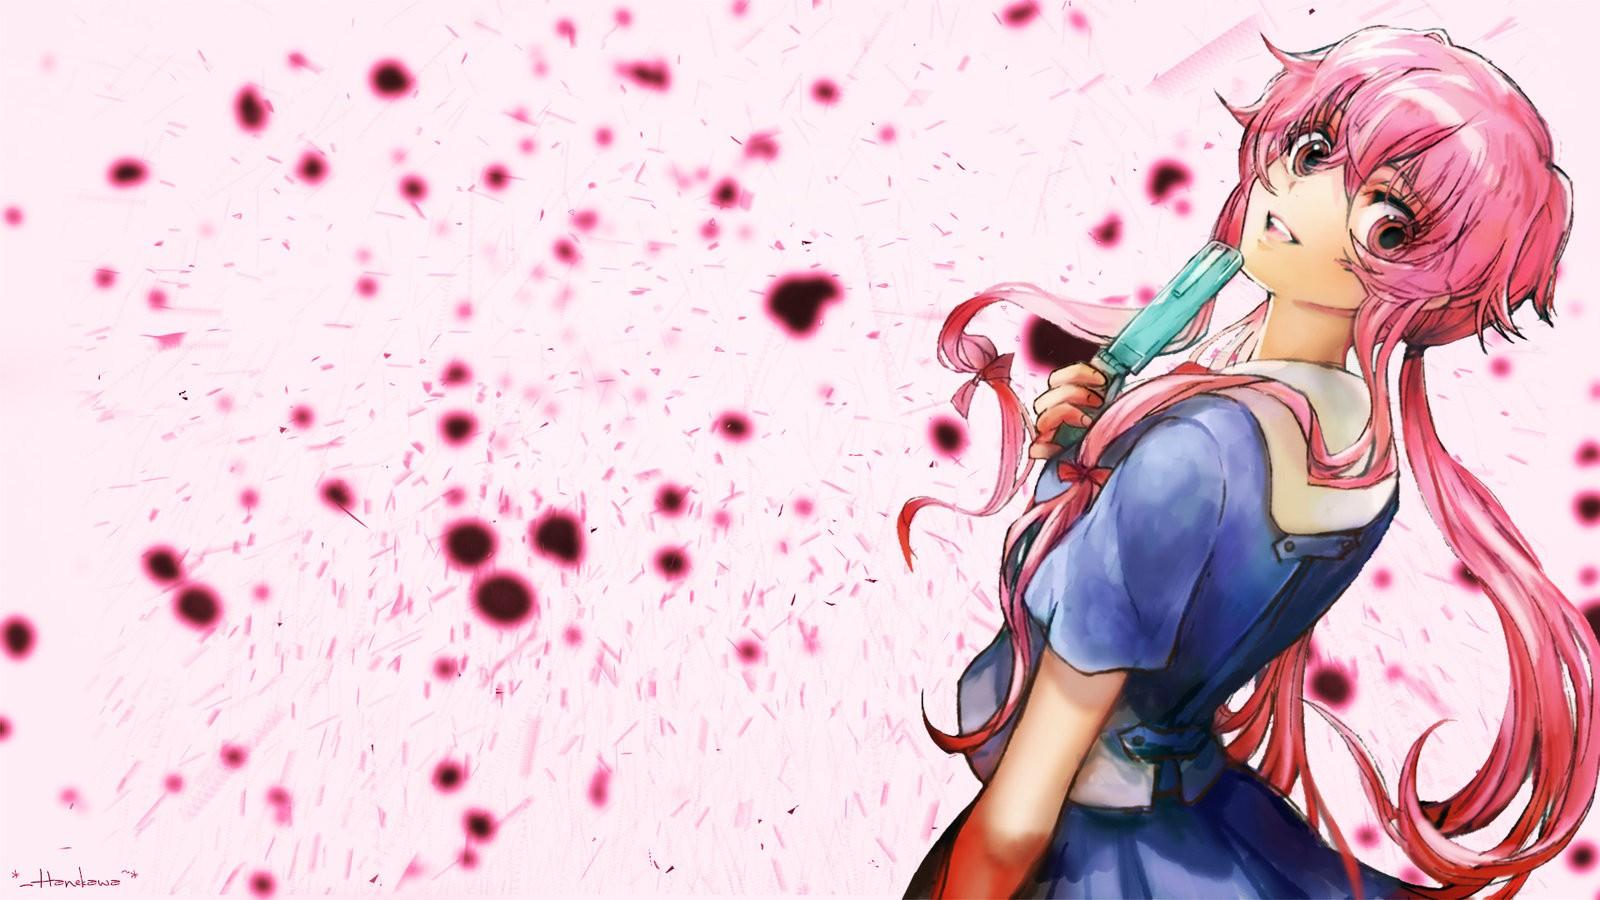 Wallpaper Illustration Anime Mirai Nikki Gasai Yuno Yandere Computer Wallpaper 1600x900 Phoenixblood 173118 Hd Wallpapers Wallhere